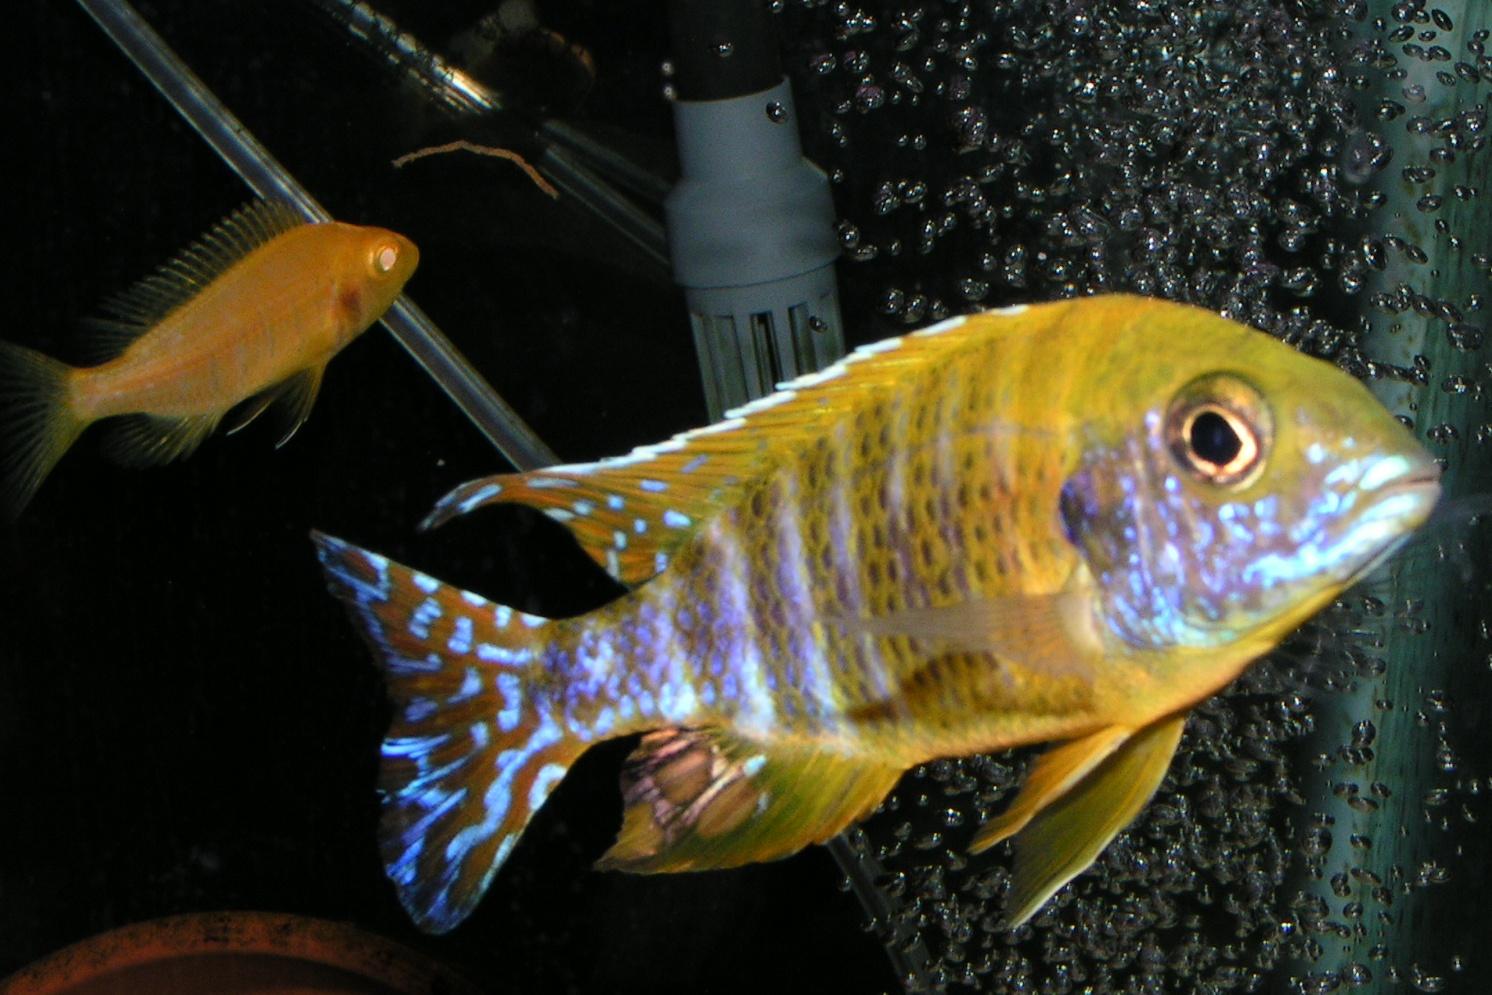 cichlids.com: Benga peacock & Albino Sunburst female